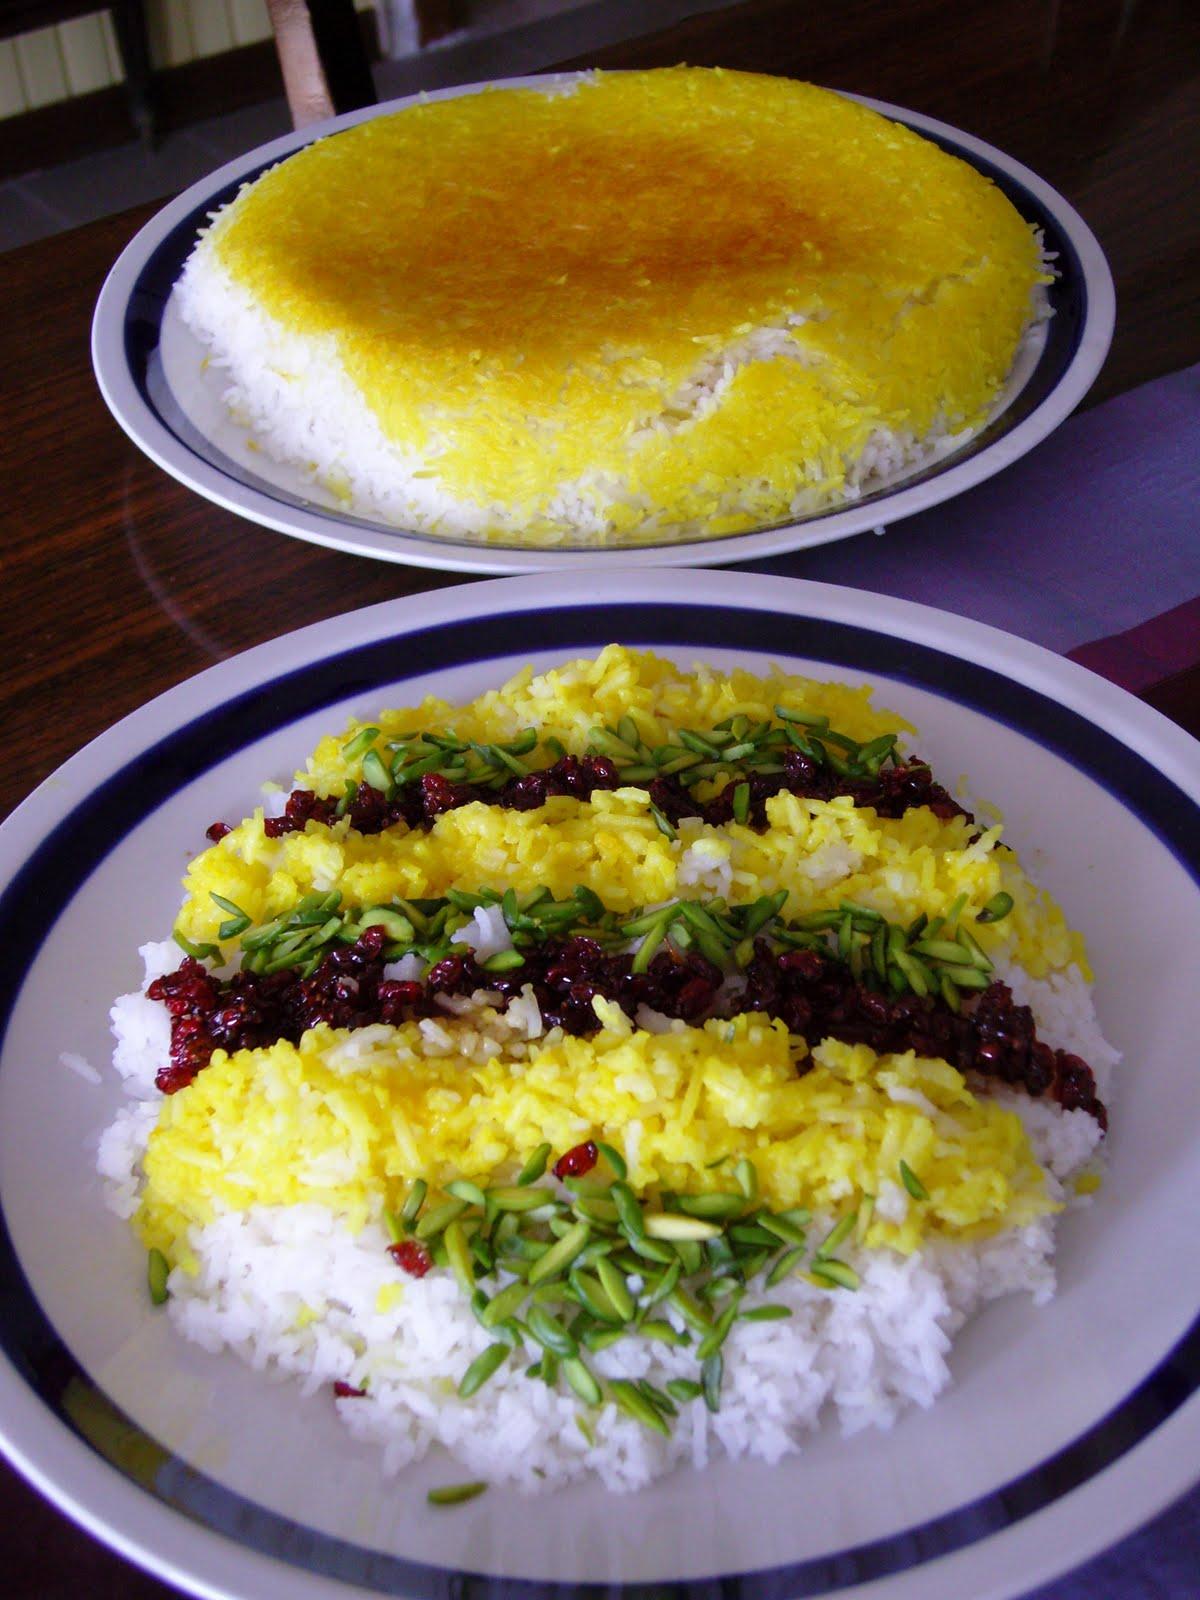 La mia cucina persiana cucinare alla persiana a san for Cucinare cetrioli